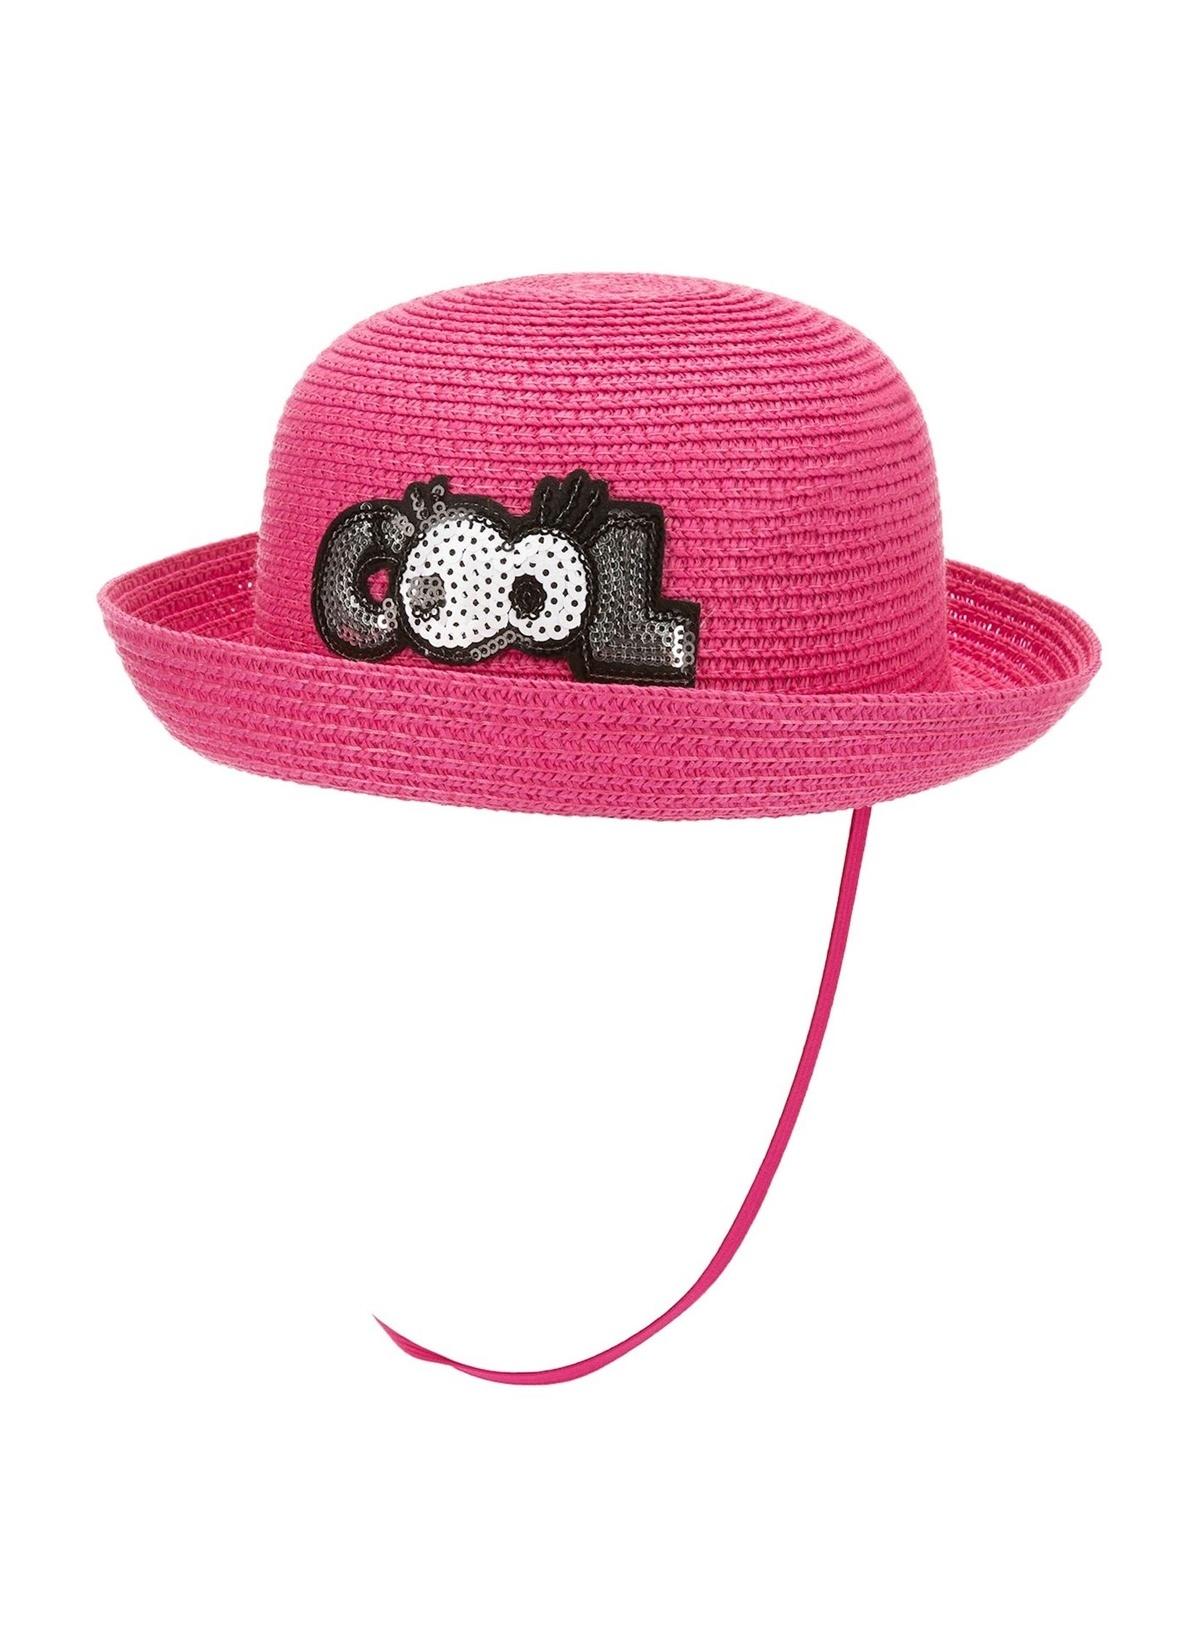 Defacto Şapka G8372a4z17smpn233 Pullu Yazı Baskılı Has – 17.99 TL